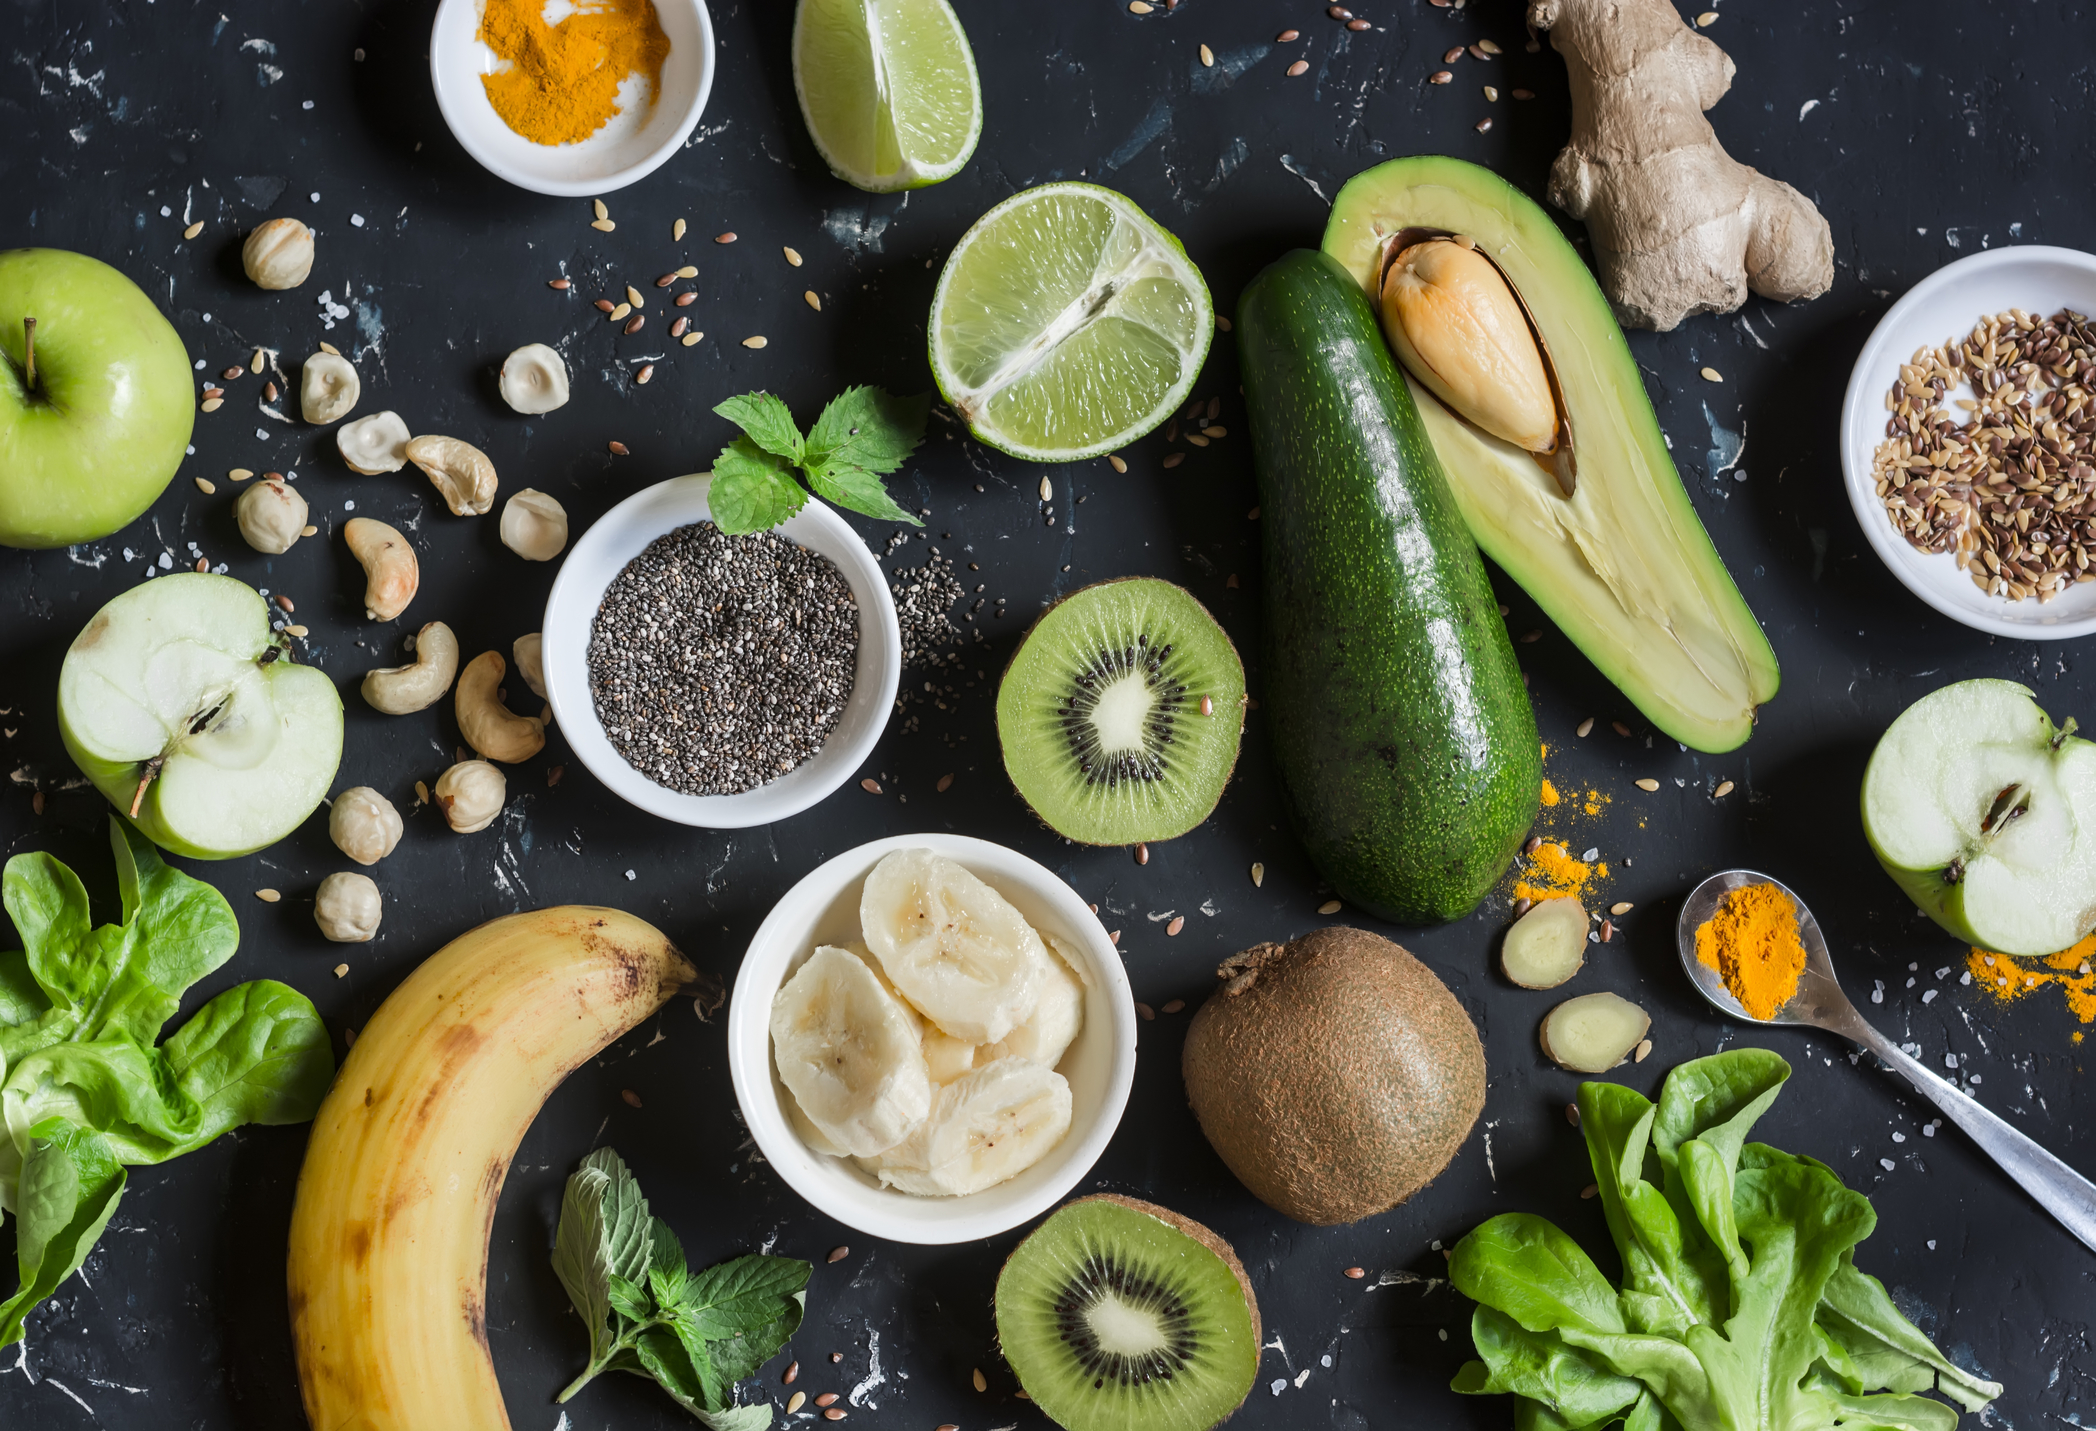 green-smoothie-ingredients-cooking-healthy-detox-smoothies-on-a-dark-background-79832057.jpg